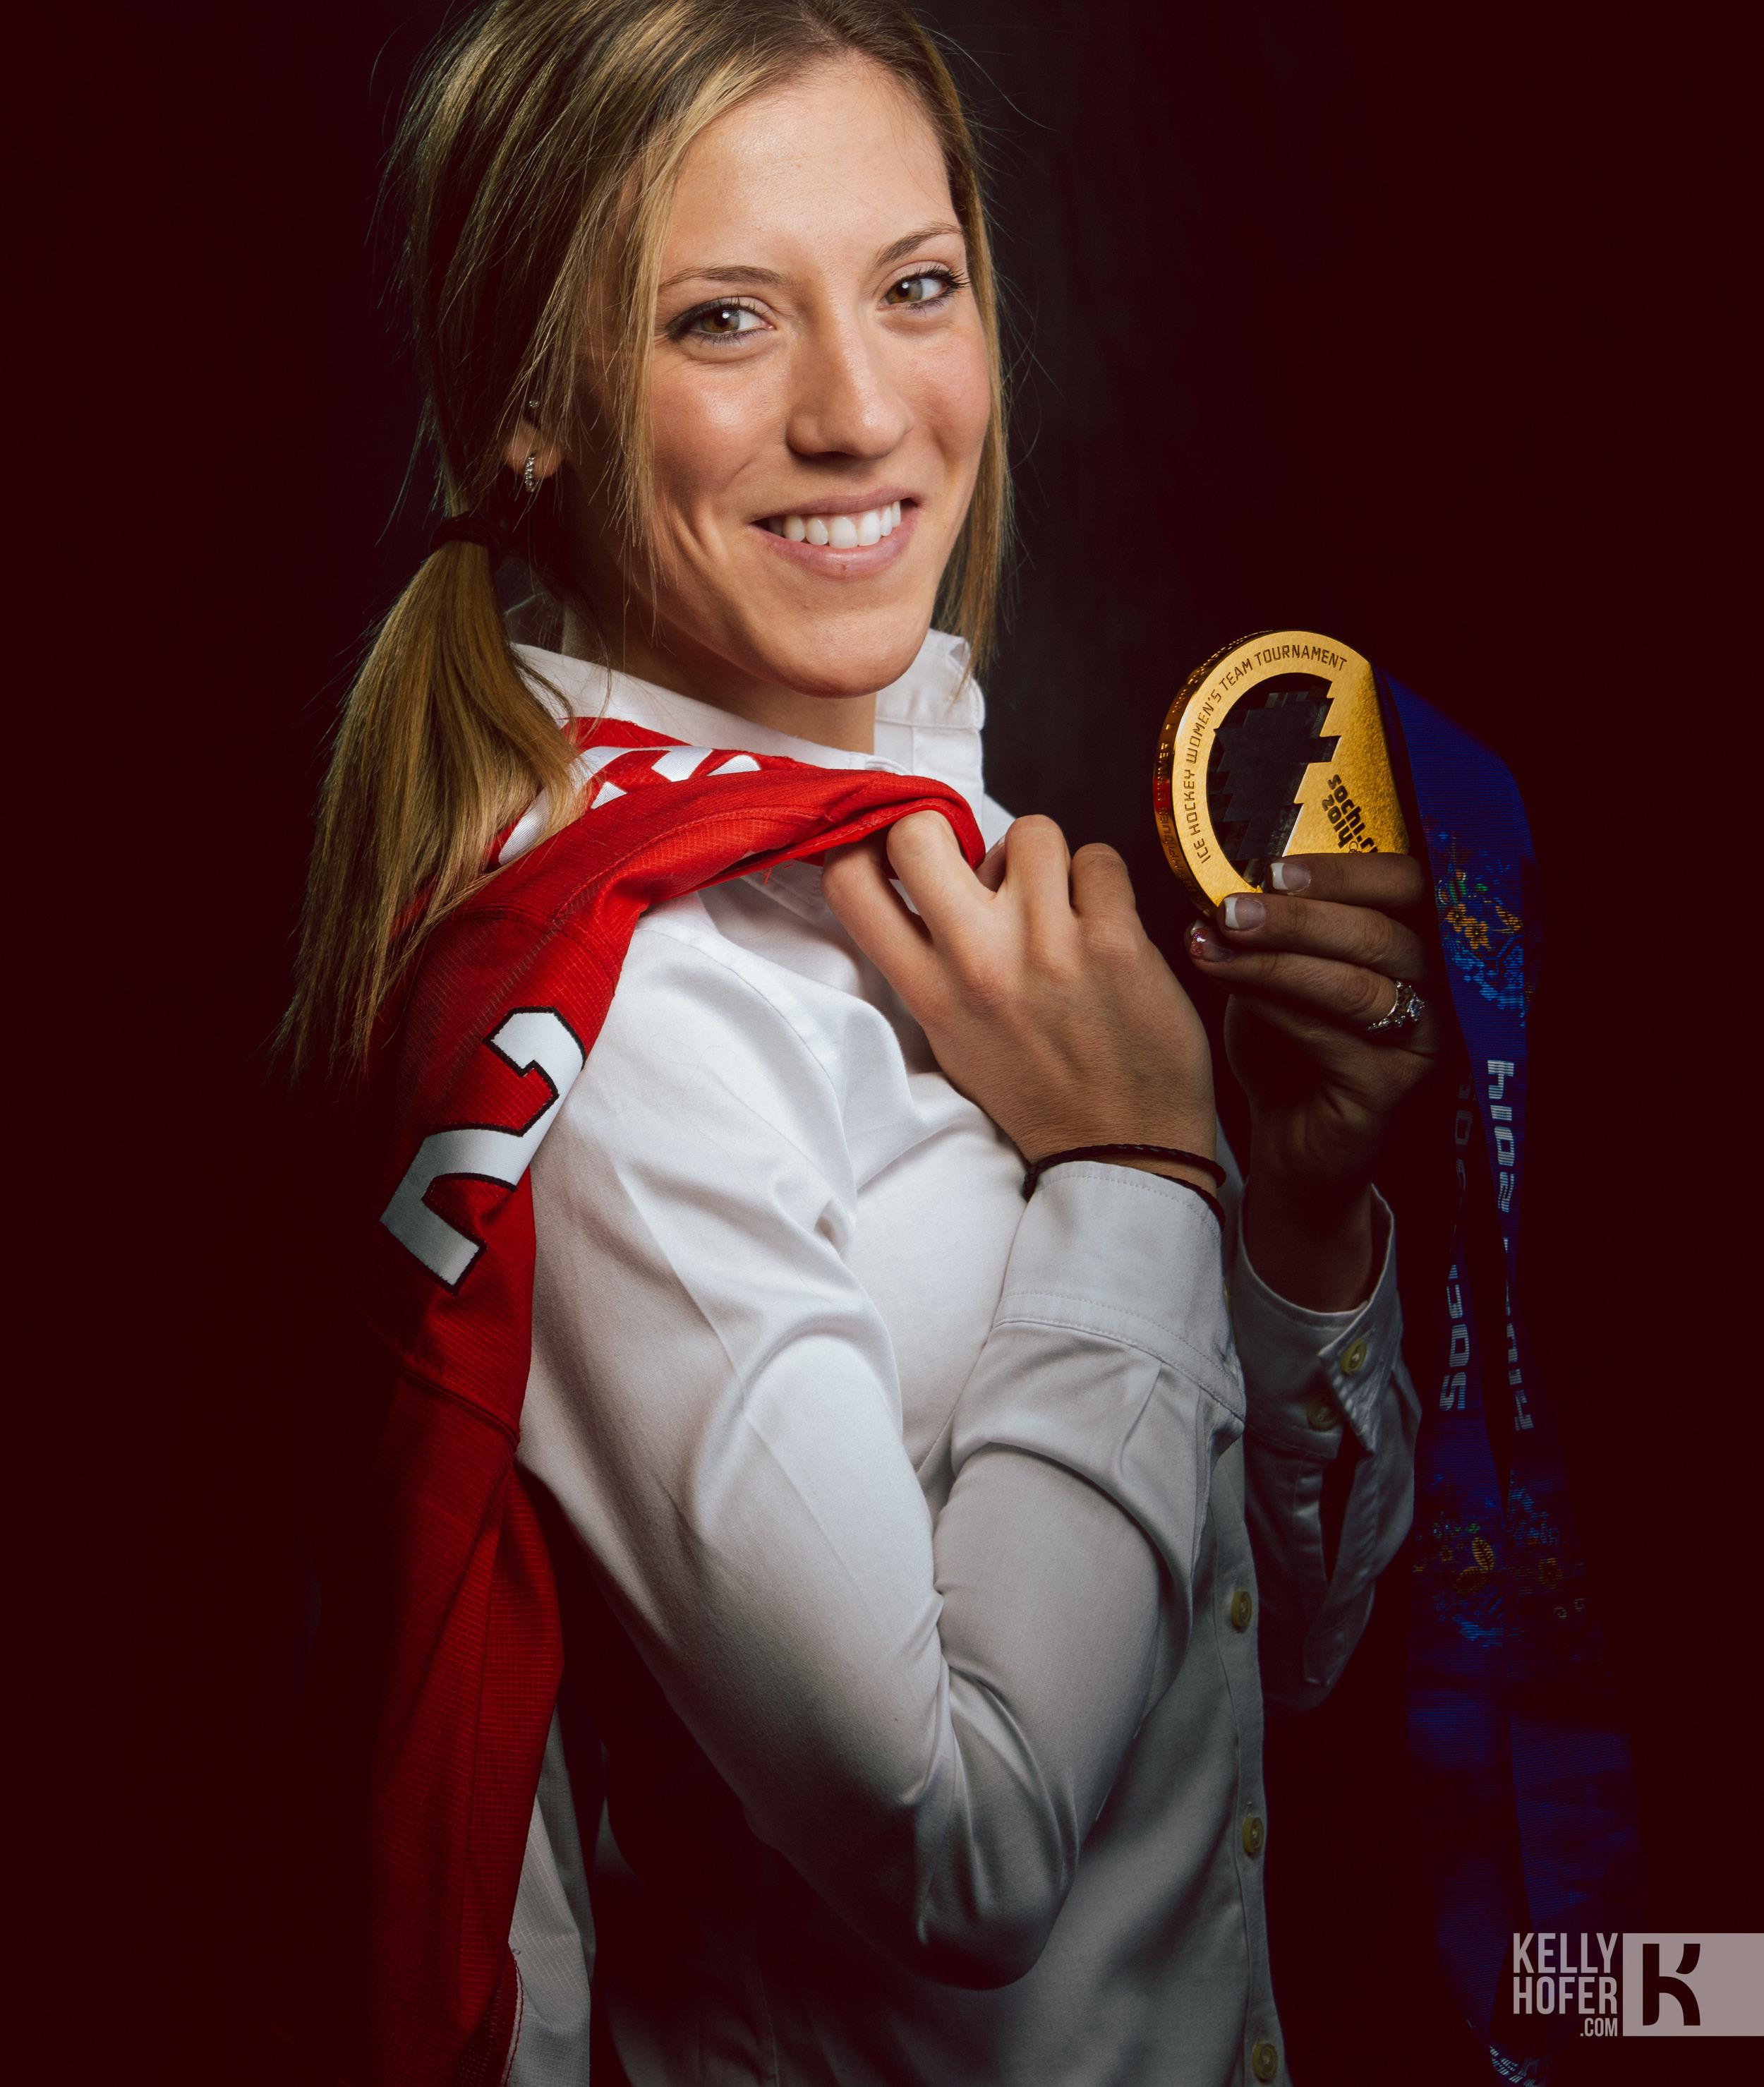 Meghan Agosta-Marciano:Image copyright: Hockeycanada.ca